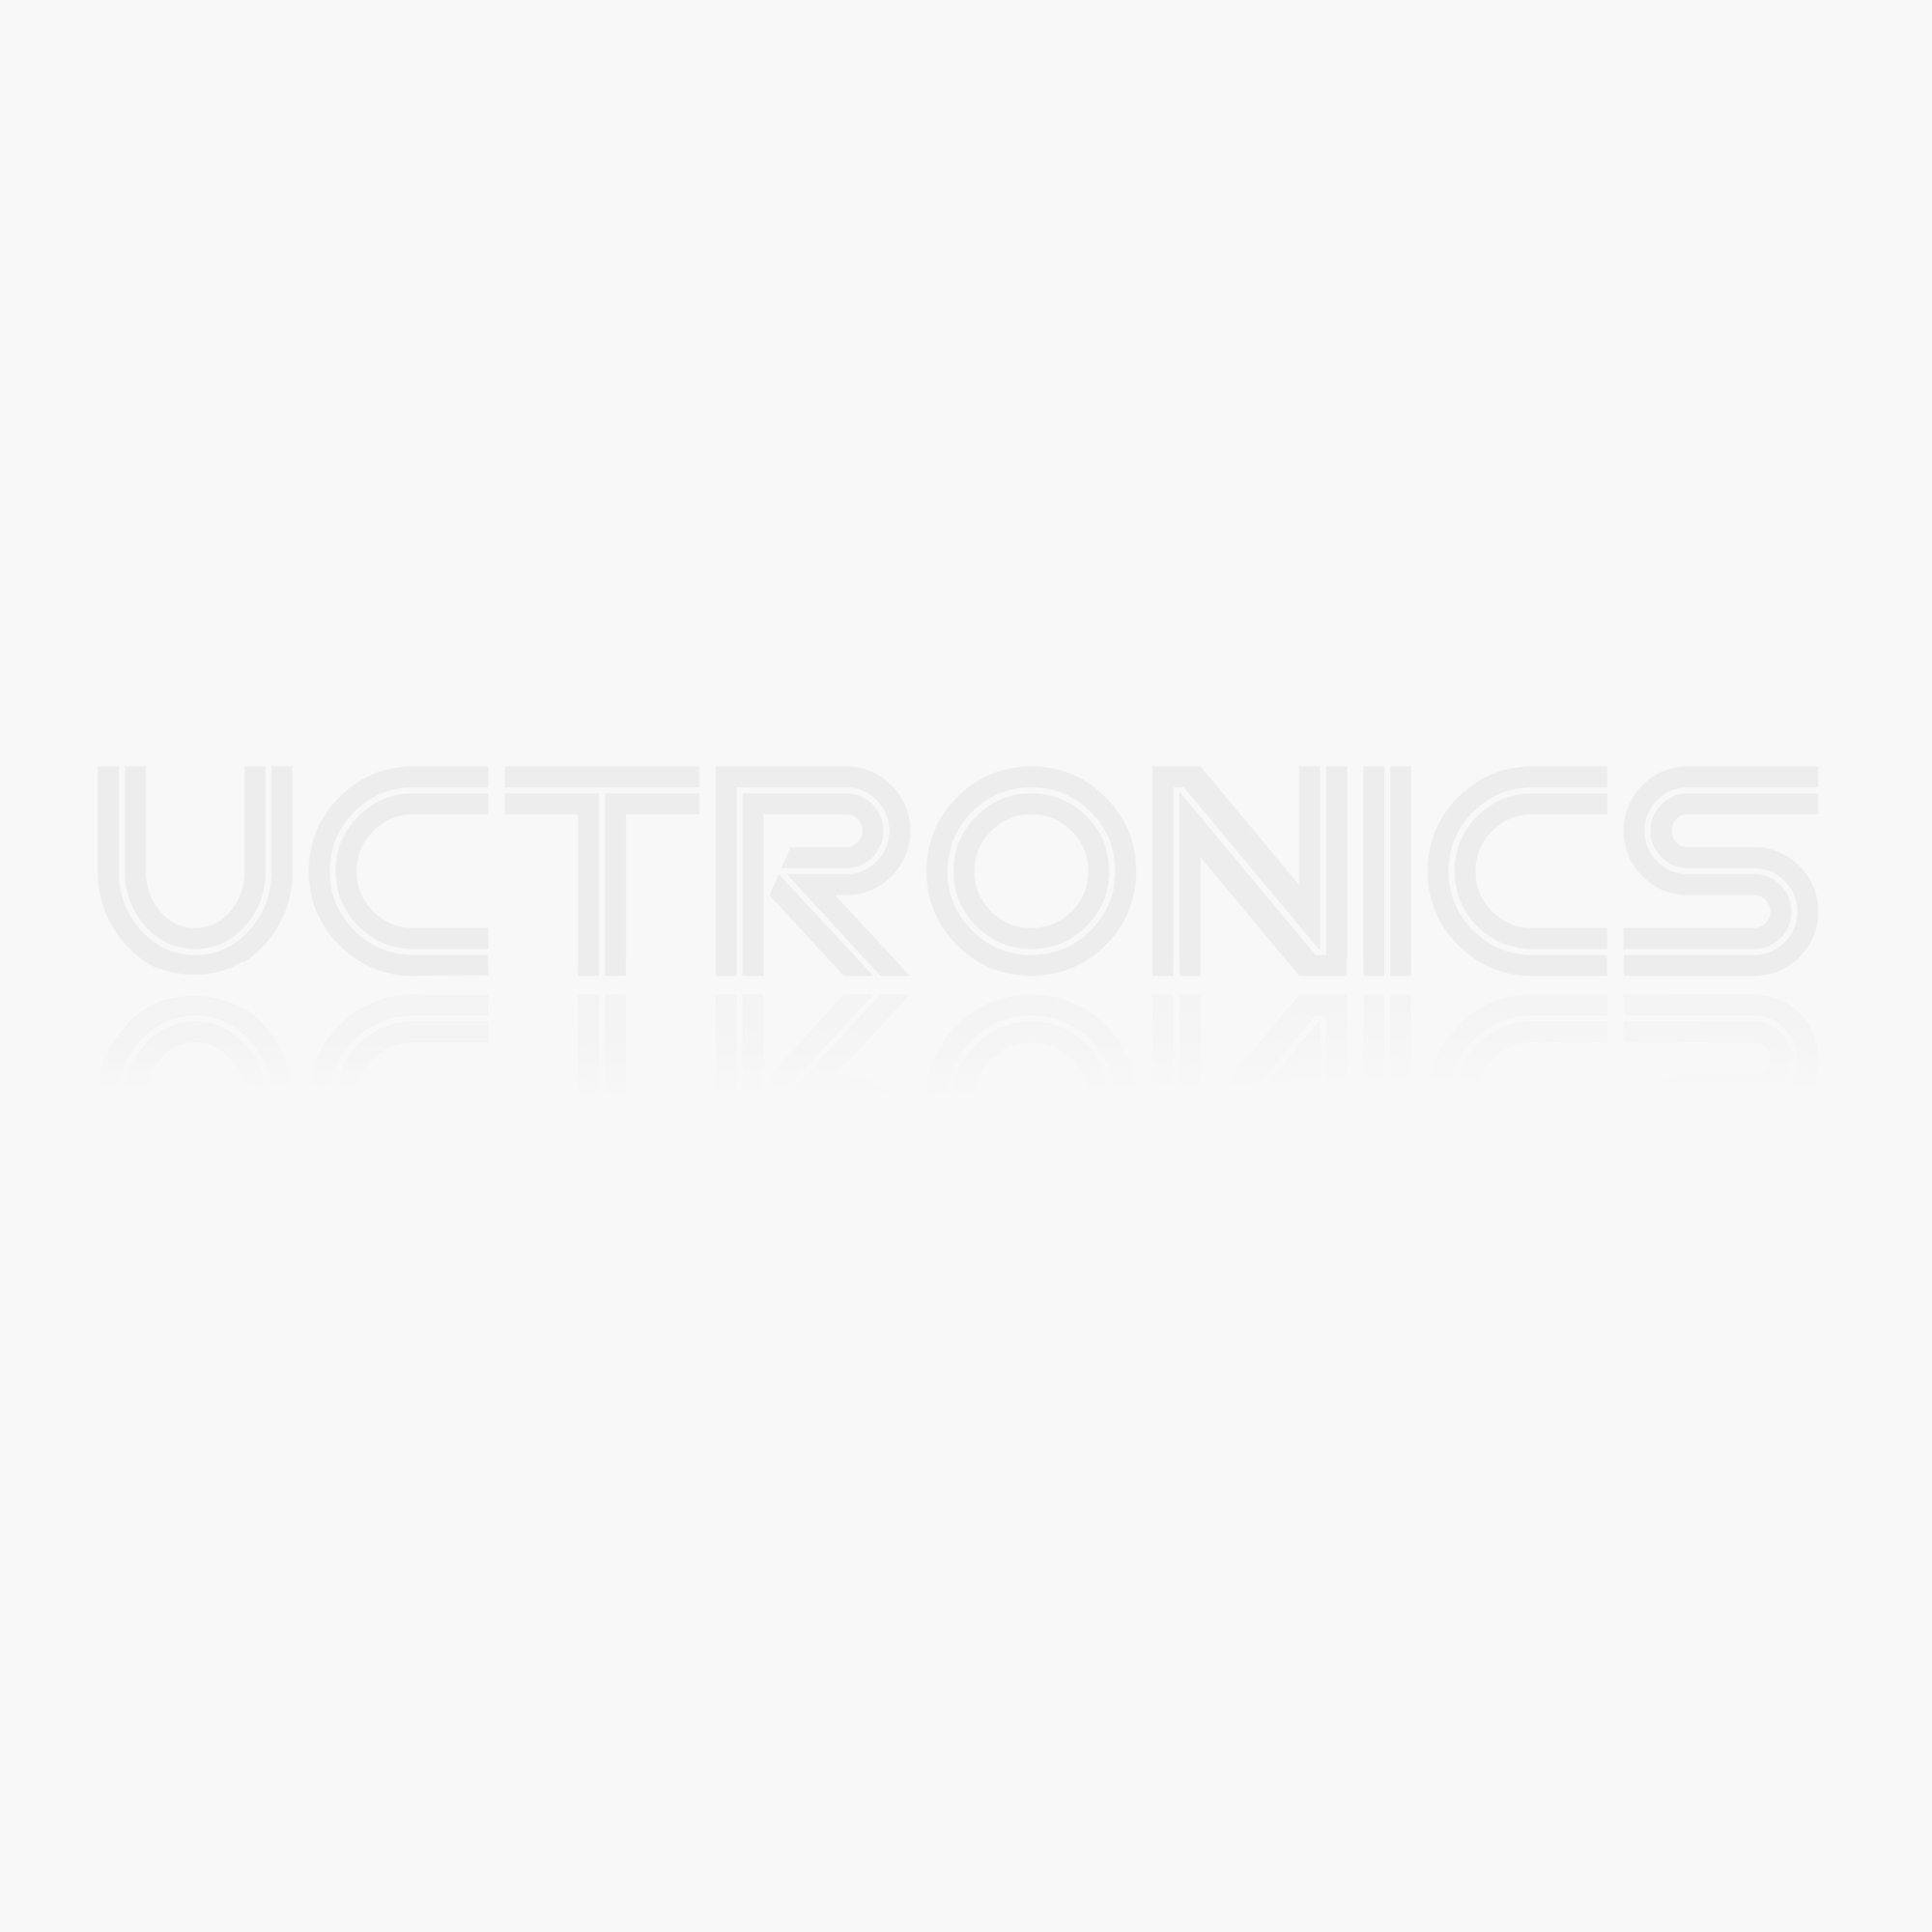 DC 5-18V Light Control Switch Sensor Circuit Module